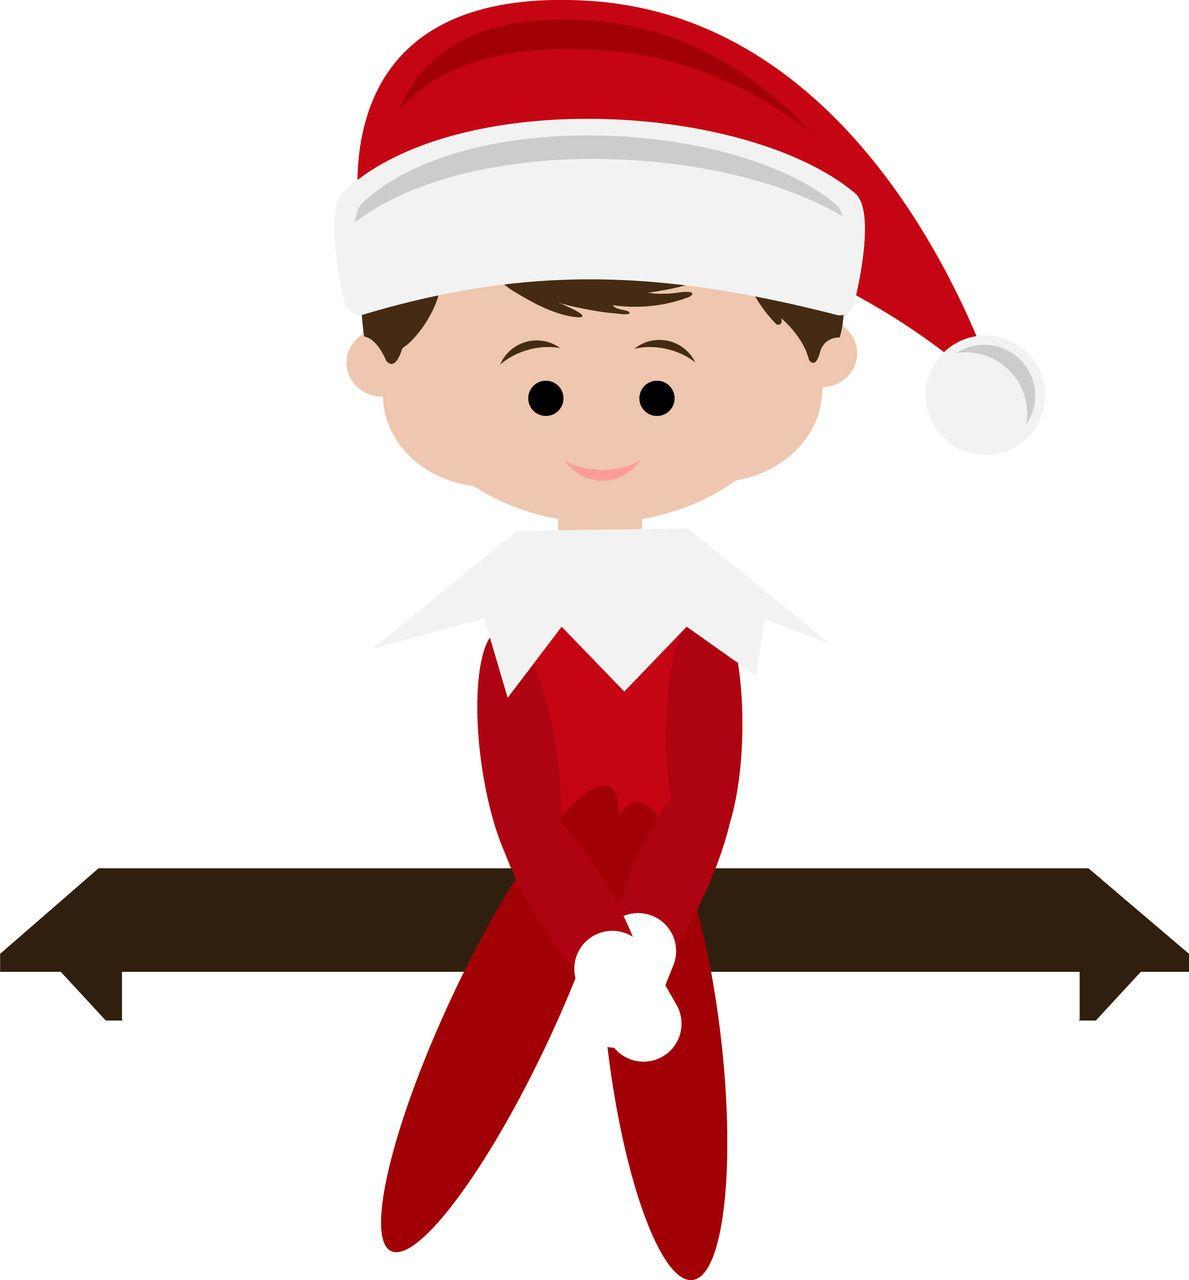 Elf On The Shelf Svg Google Search Christmas Elf Xmas Elf Free Christmas Greeting Cards